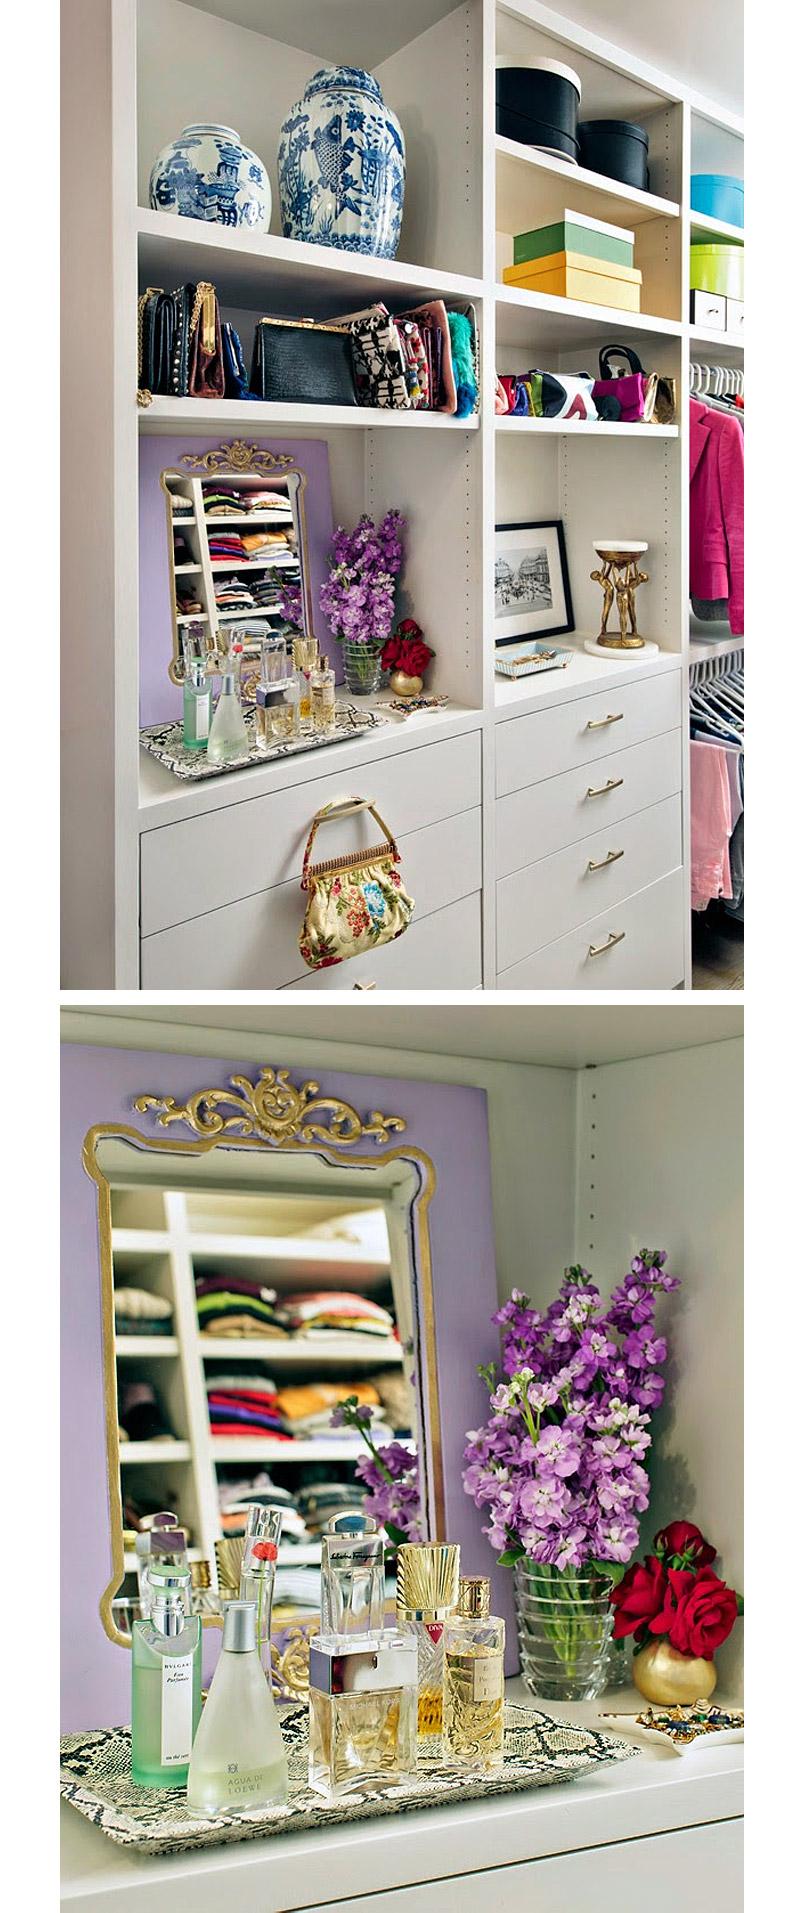 living-gazette-barbara-resende-decor-closet-detalhes-bijoux-perfumes